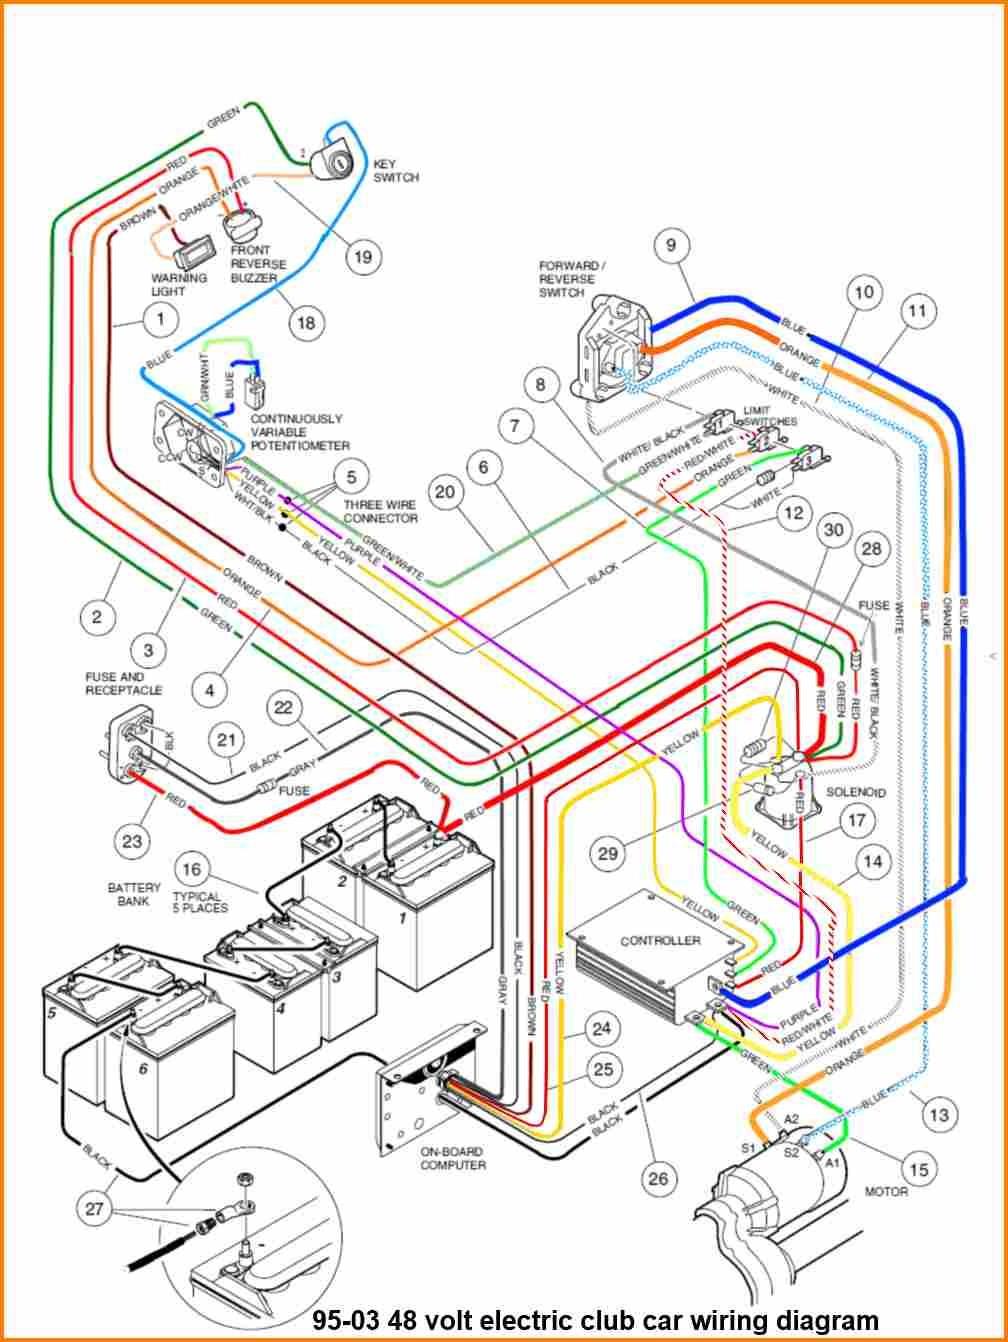 95 ezgo marathon golf cart wiring diagram 99 ford f 350 van fuse ...  free download wiring diagrams 2020 full edition - trusted wiring ...